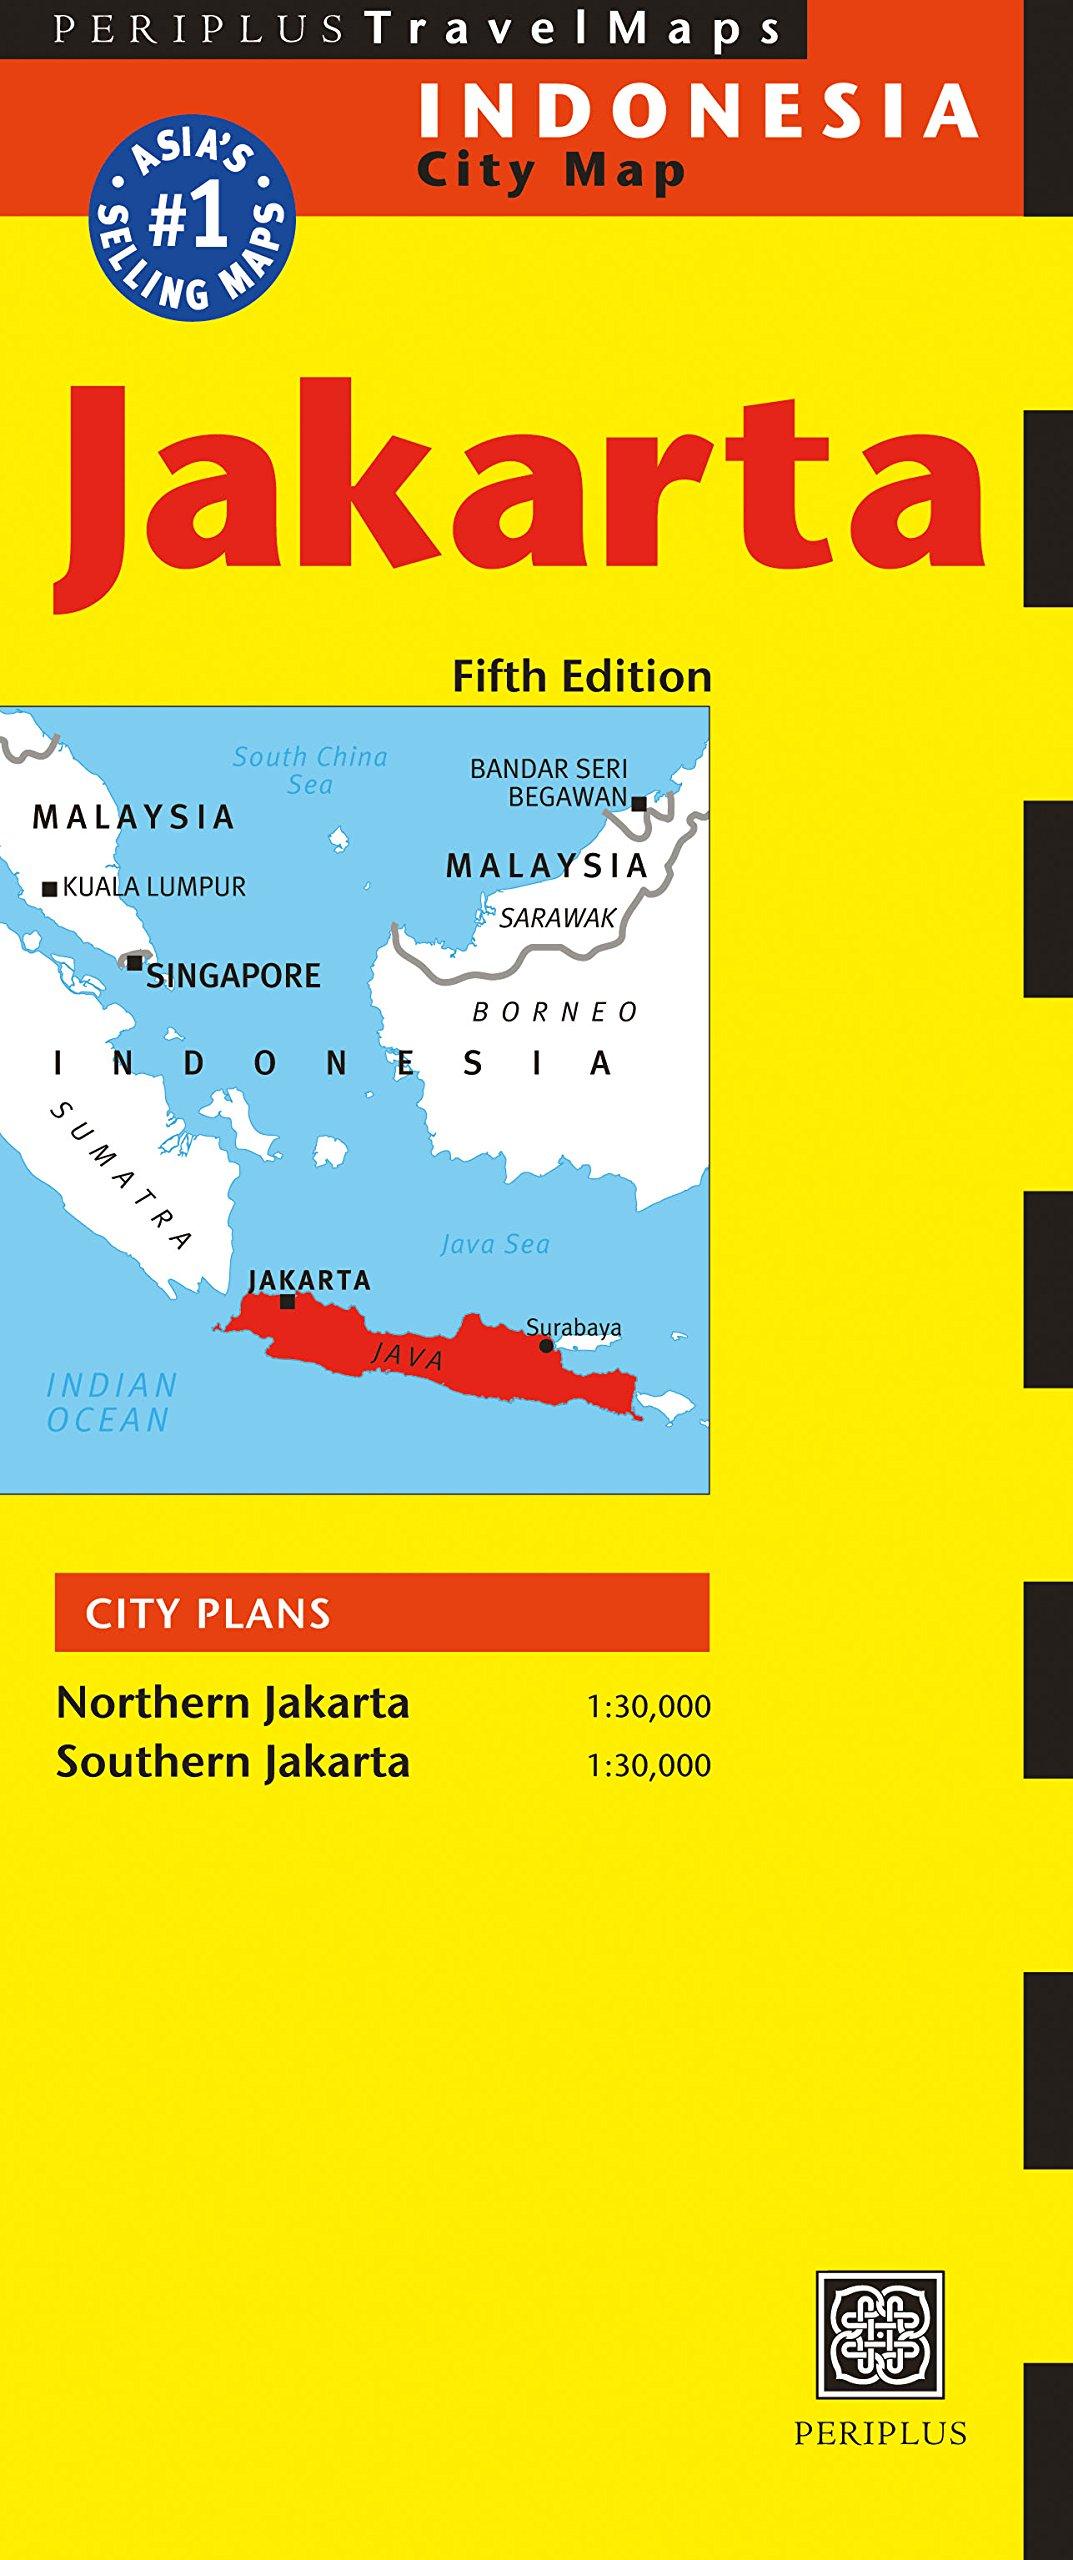 Jakarta Travel Map Sixth Edition Periplus Travel Maps Periplus Editions 9780794607098 Amazon Com Books